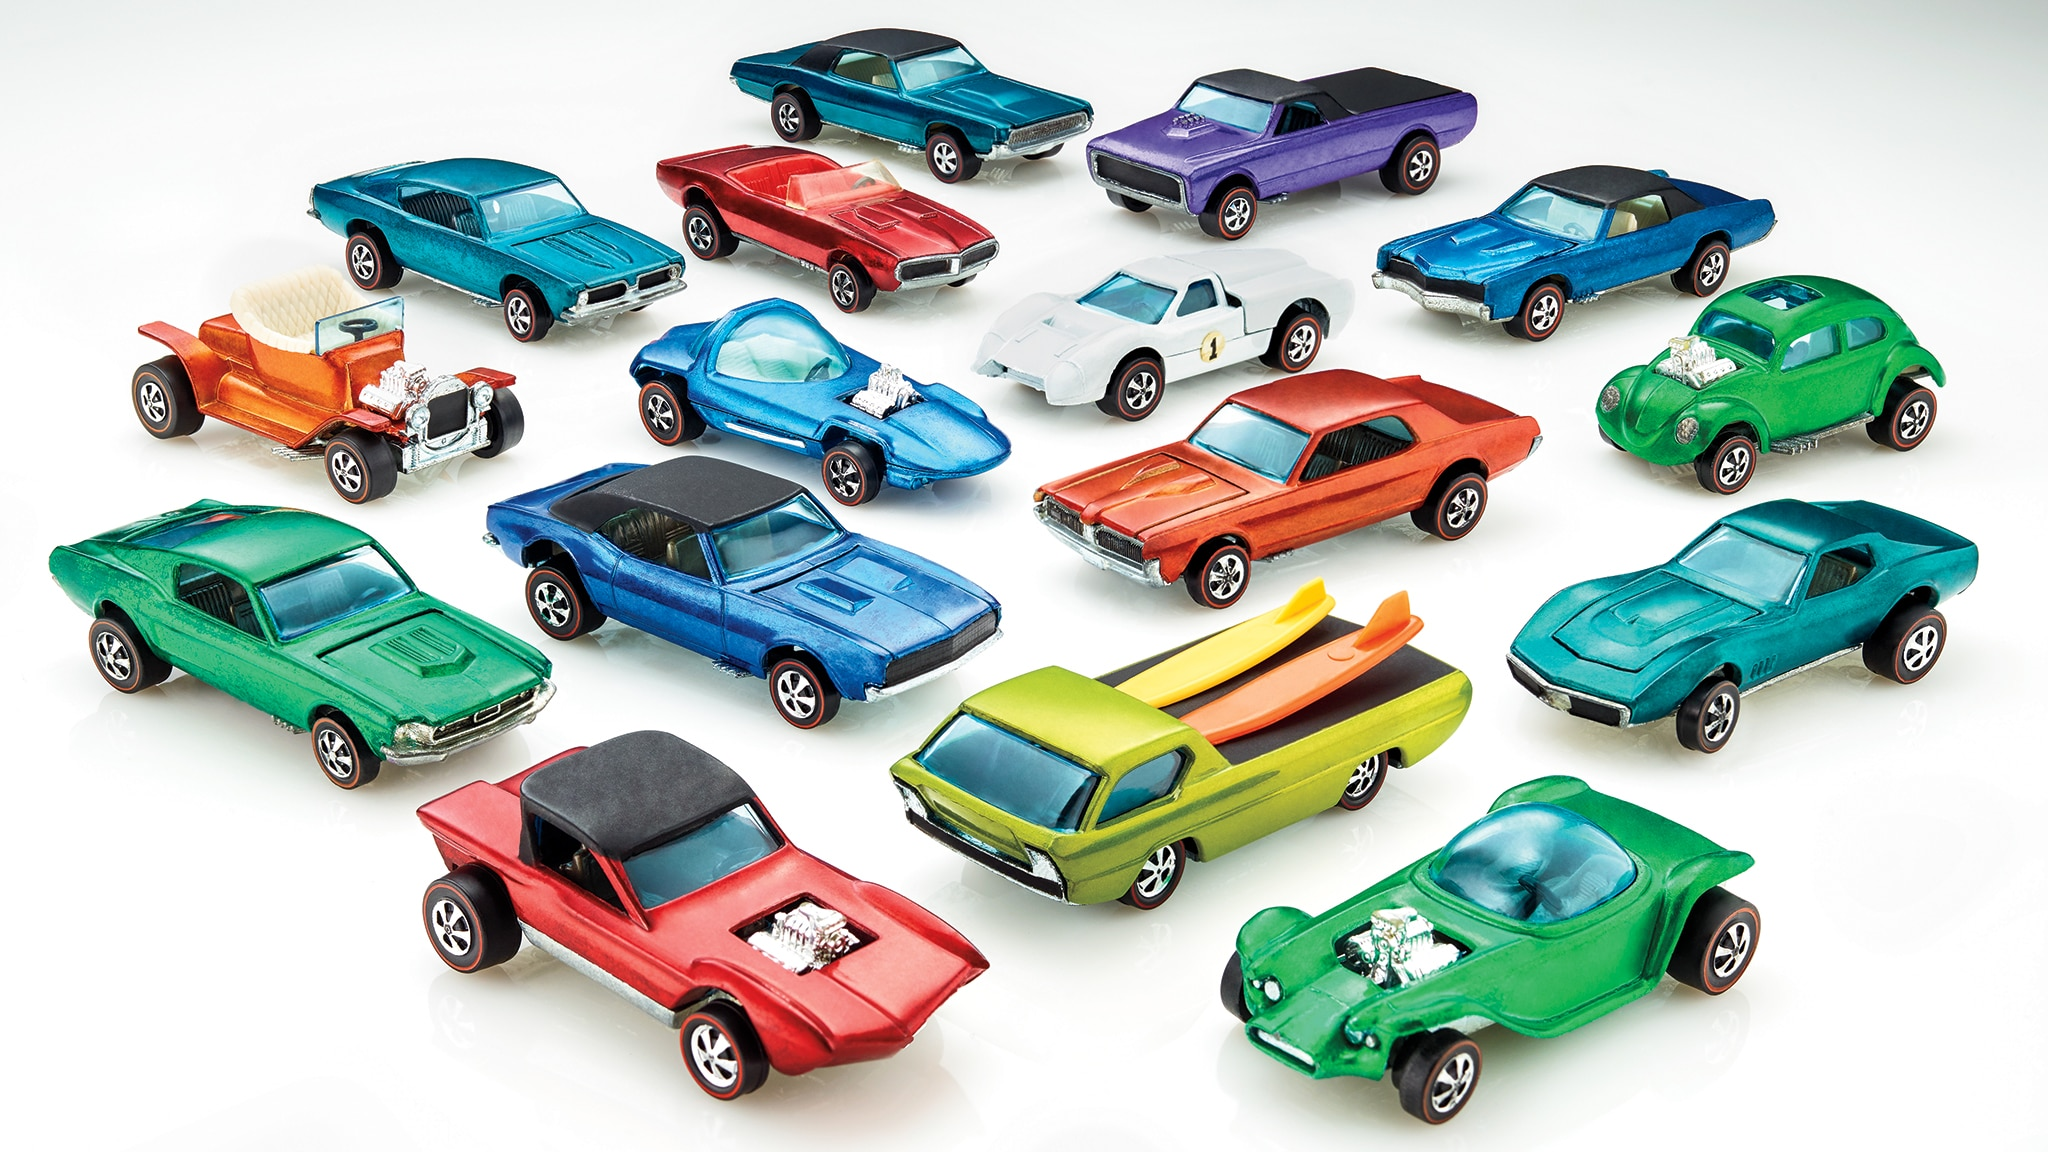 wheels toy sweet ever cars hotwheels 1968 diecast mattel toys history corvette years